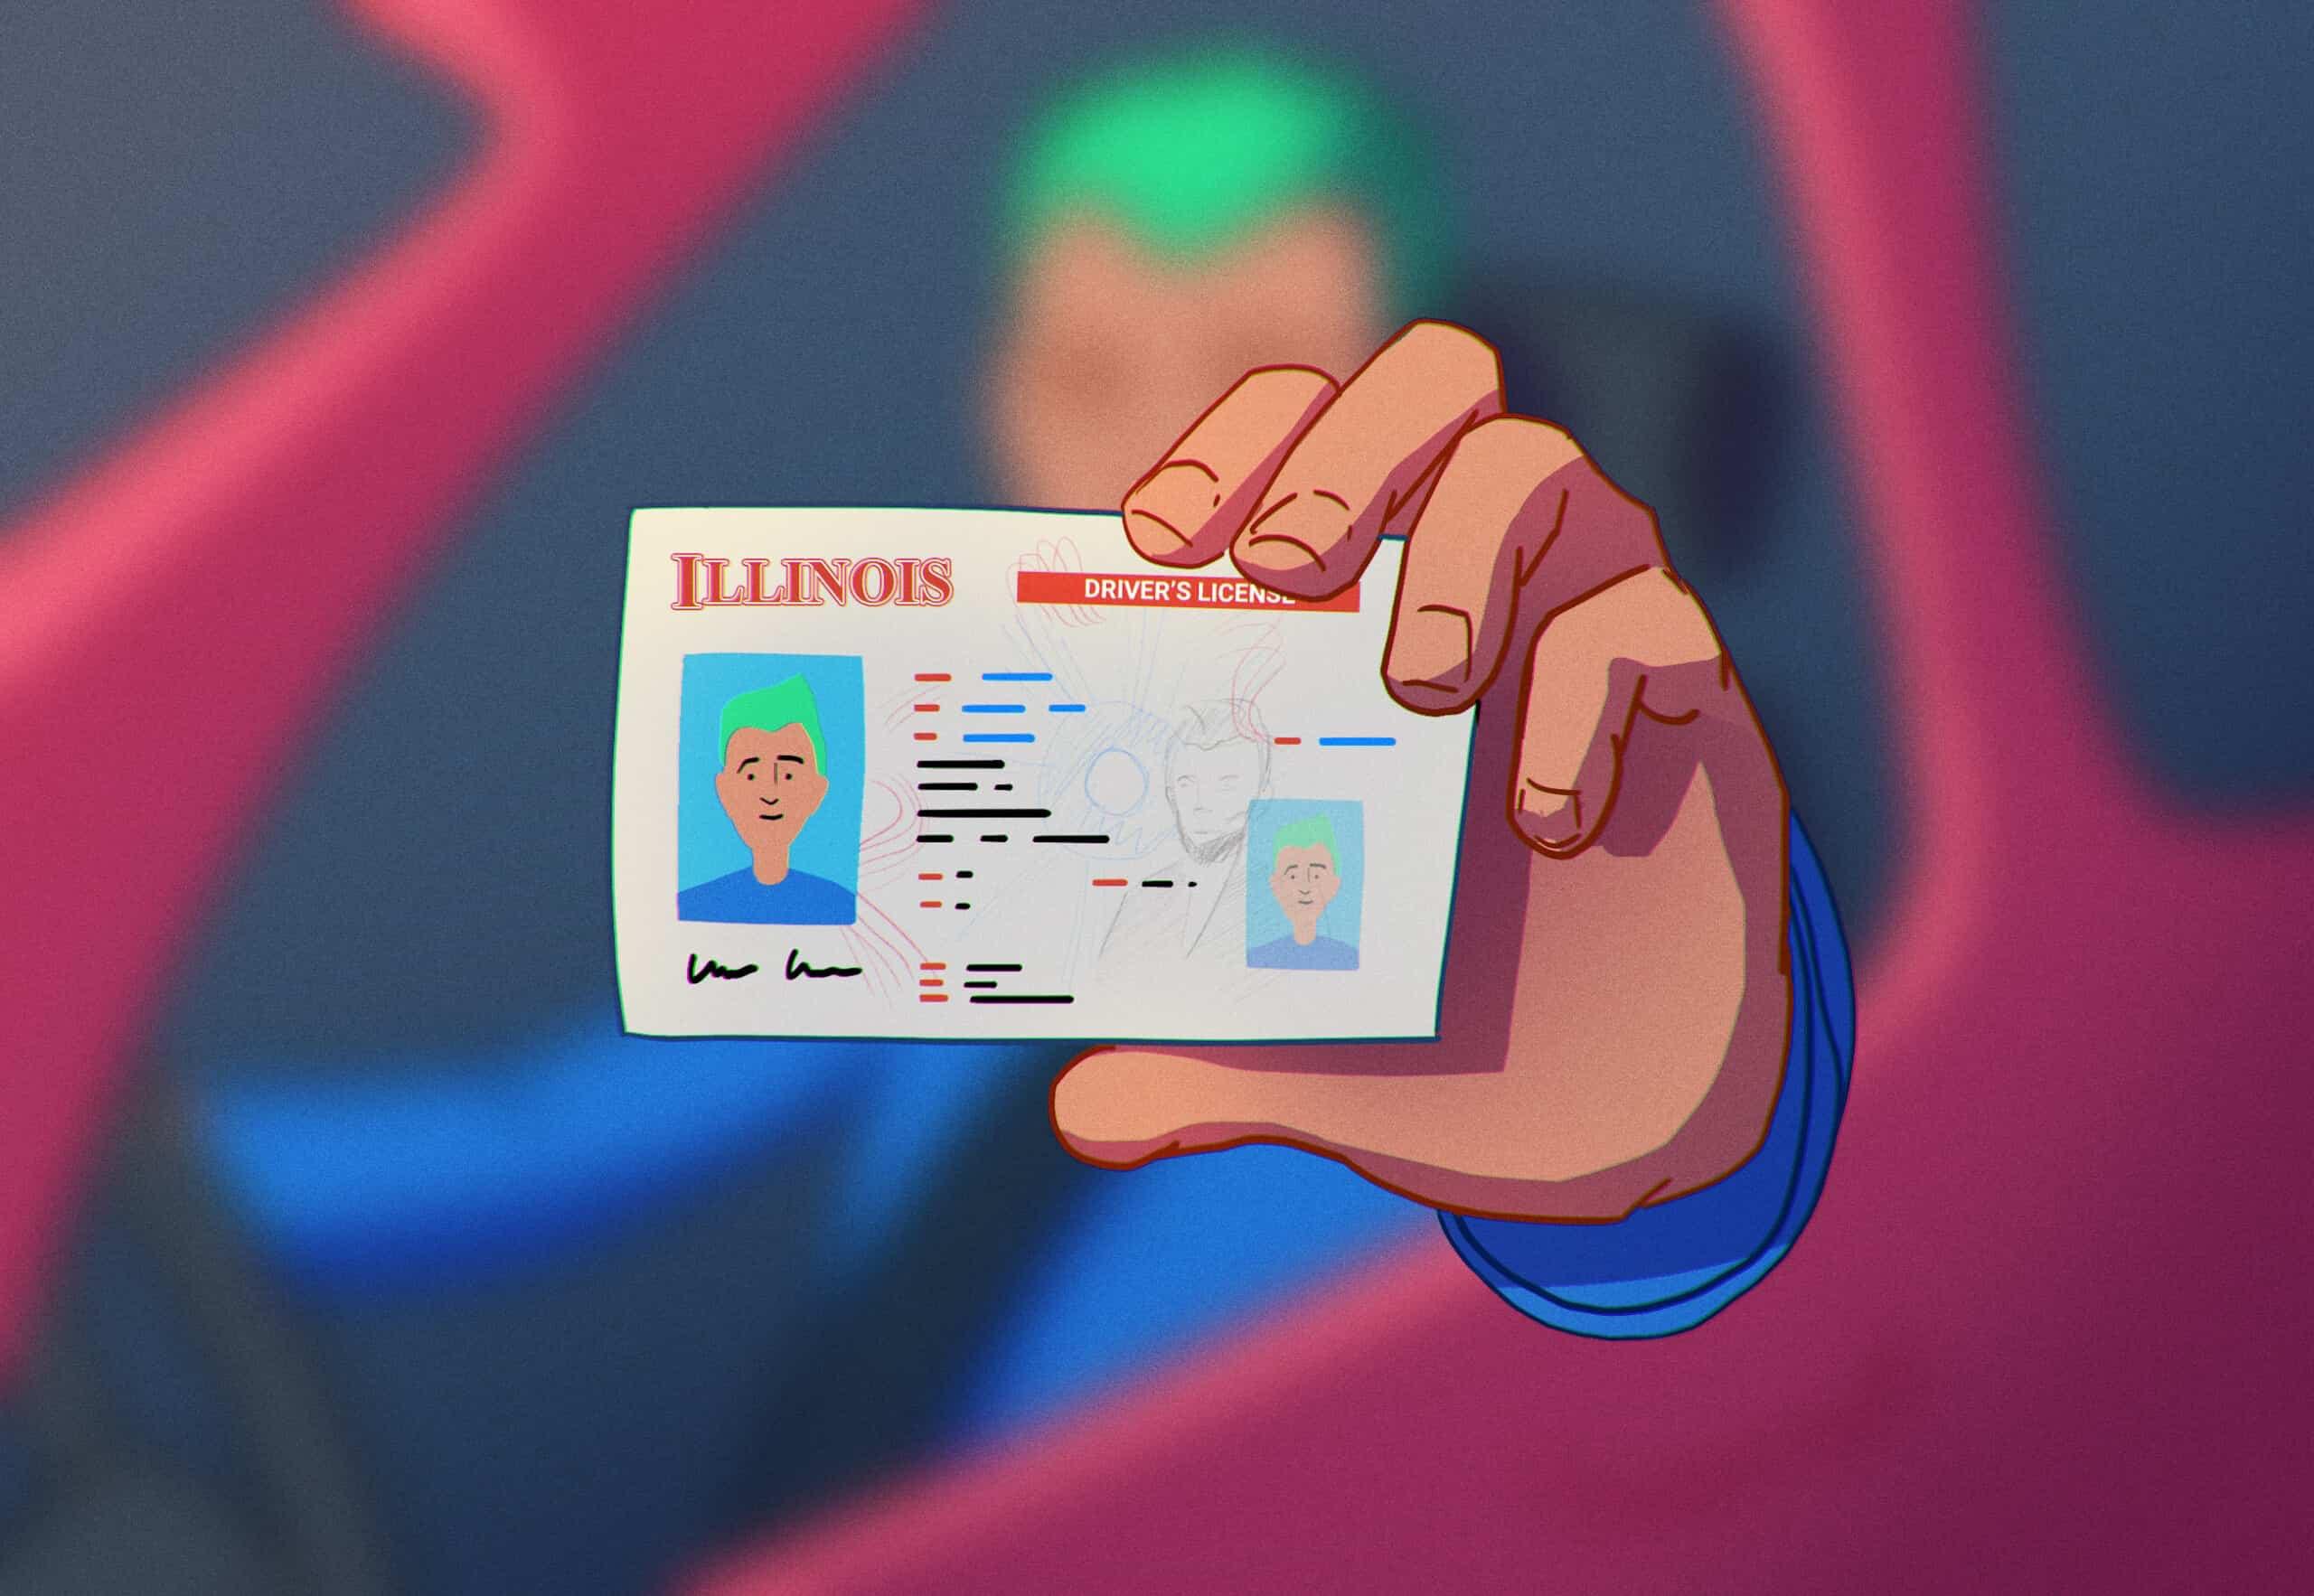 Illinois drivers license